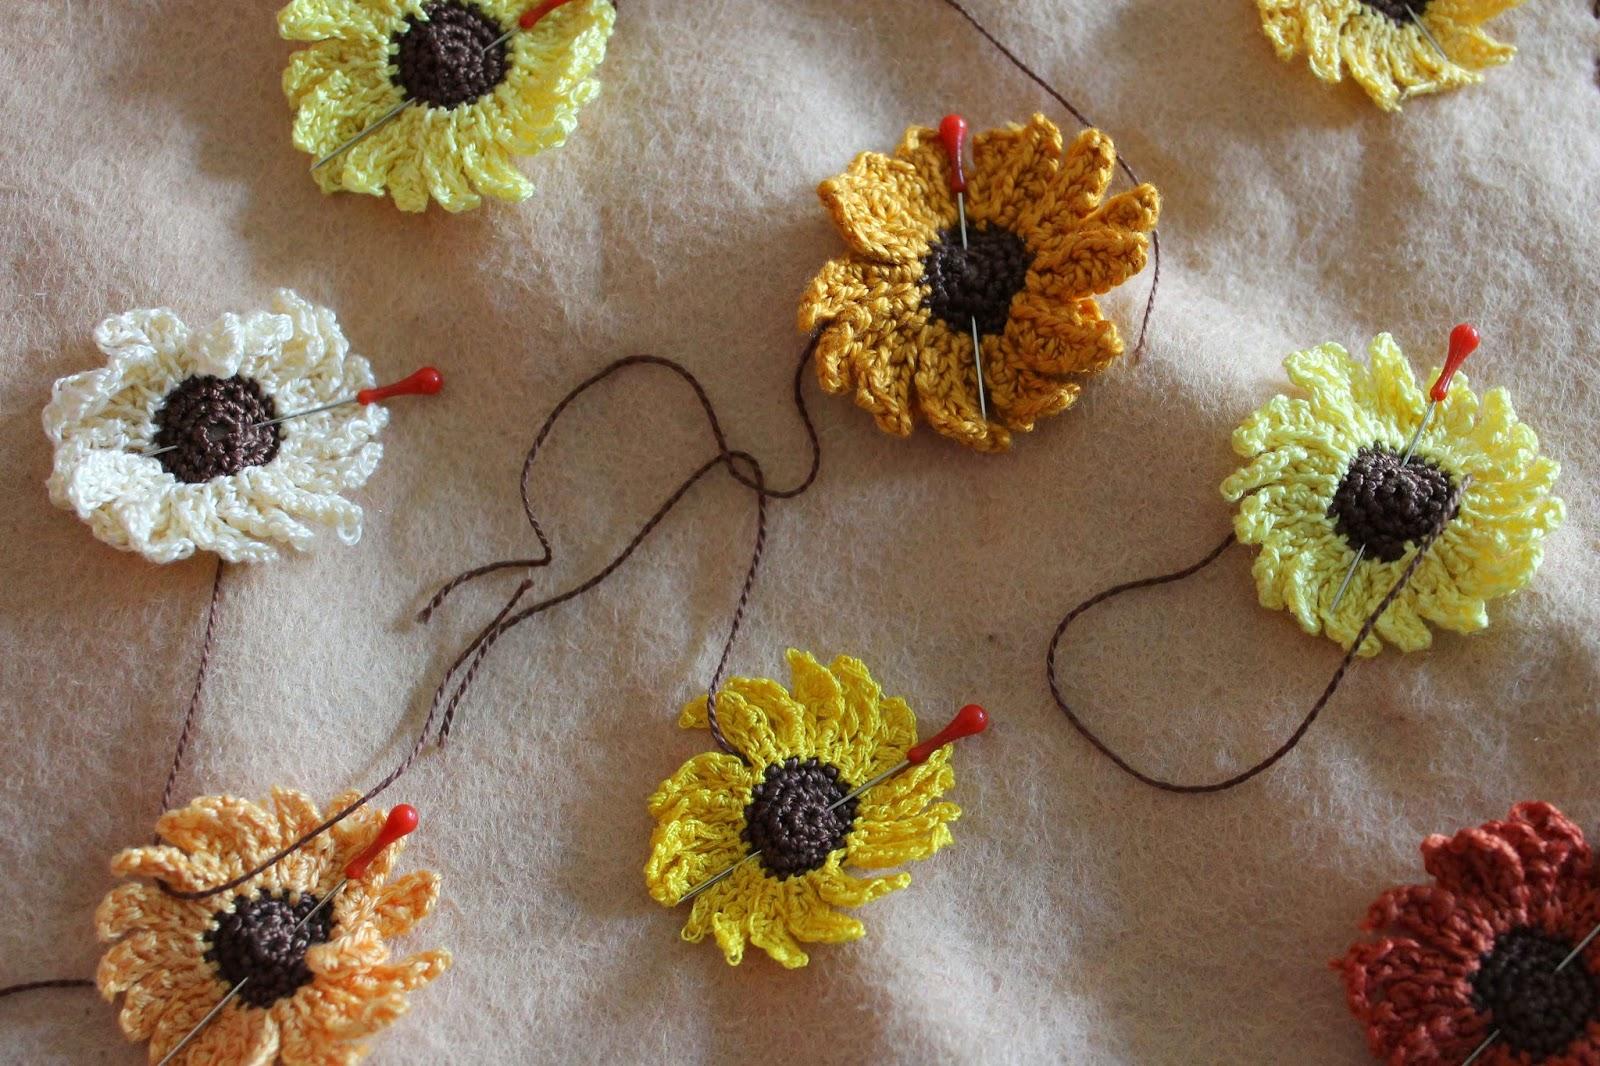 Pinning crochet sunflowers